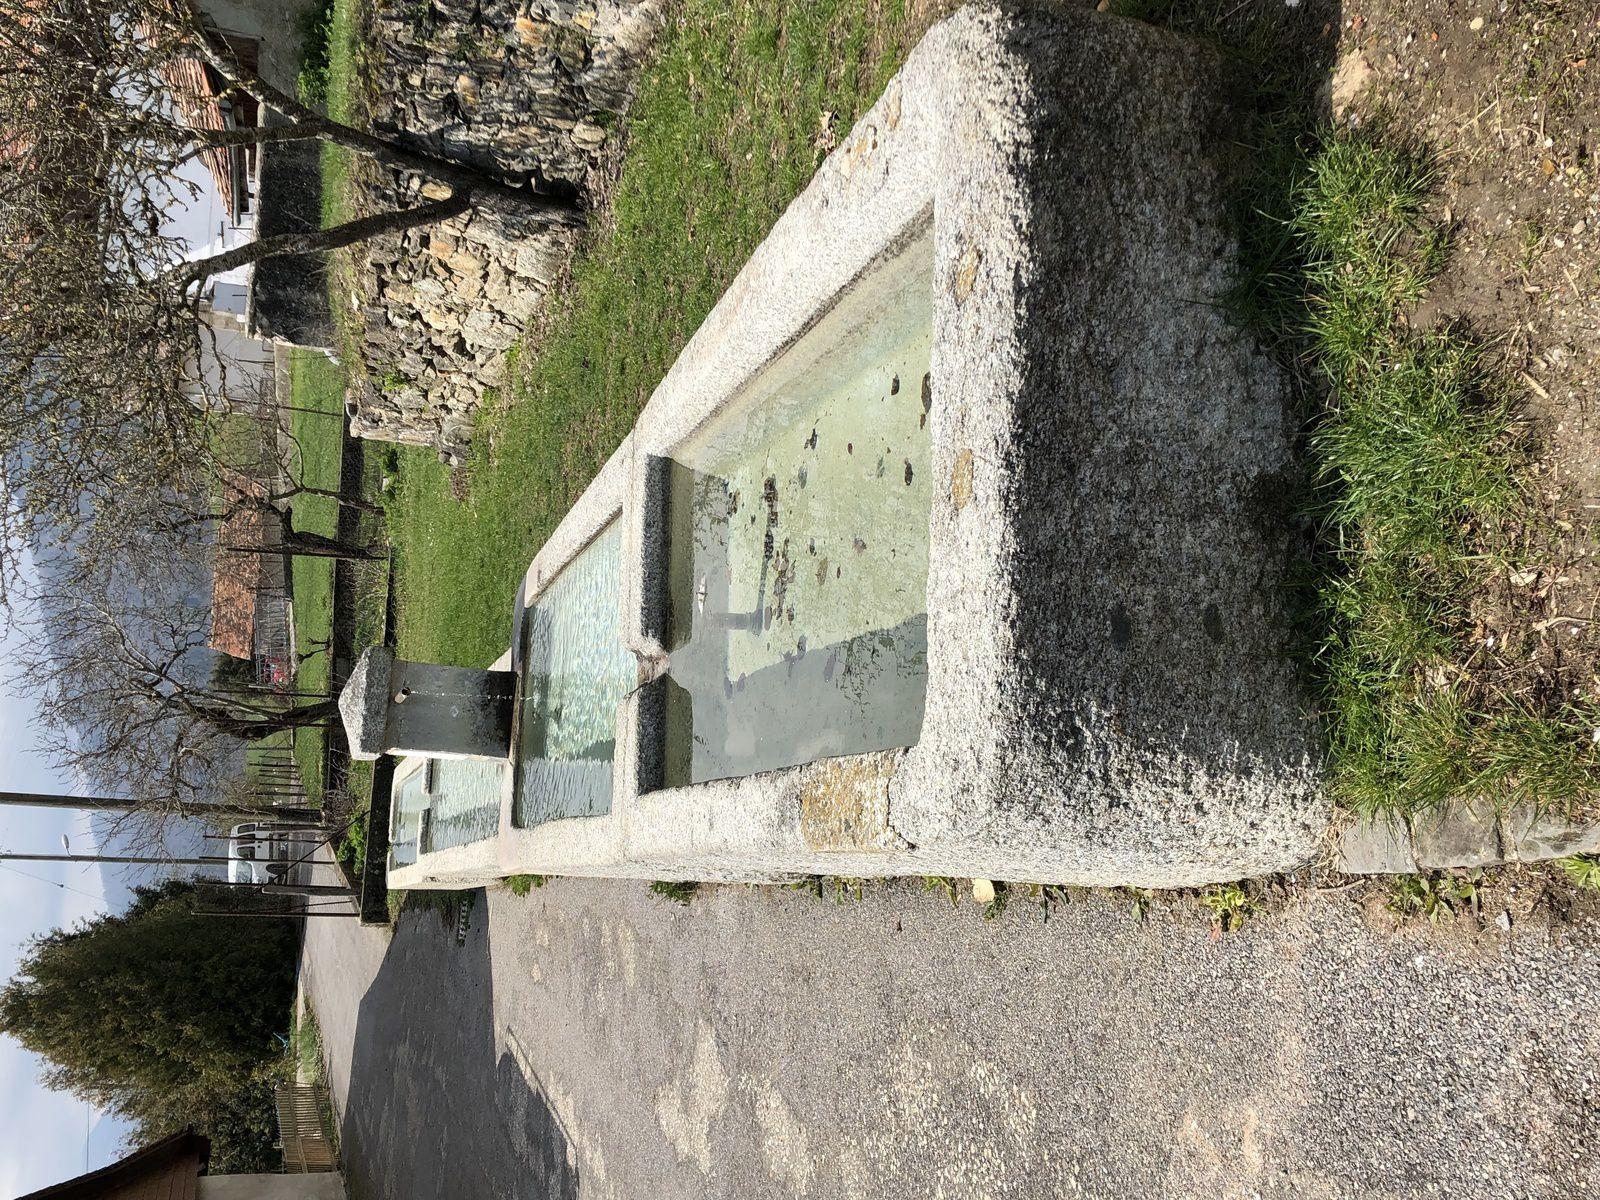 Mardi 9 Avril : Le long de l'Arnon , Villards Burquin, Champagne